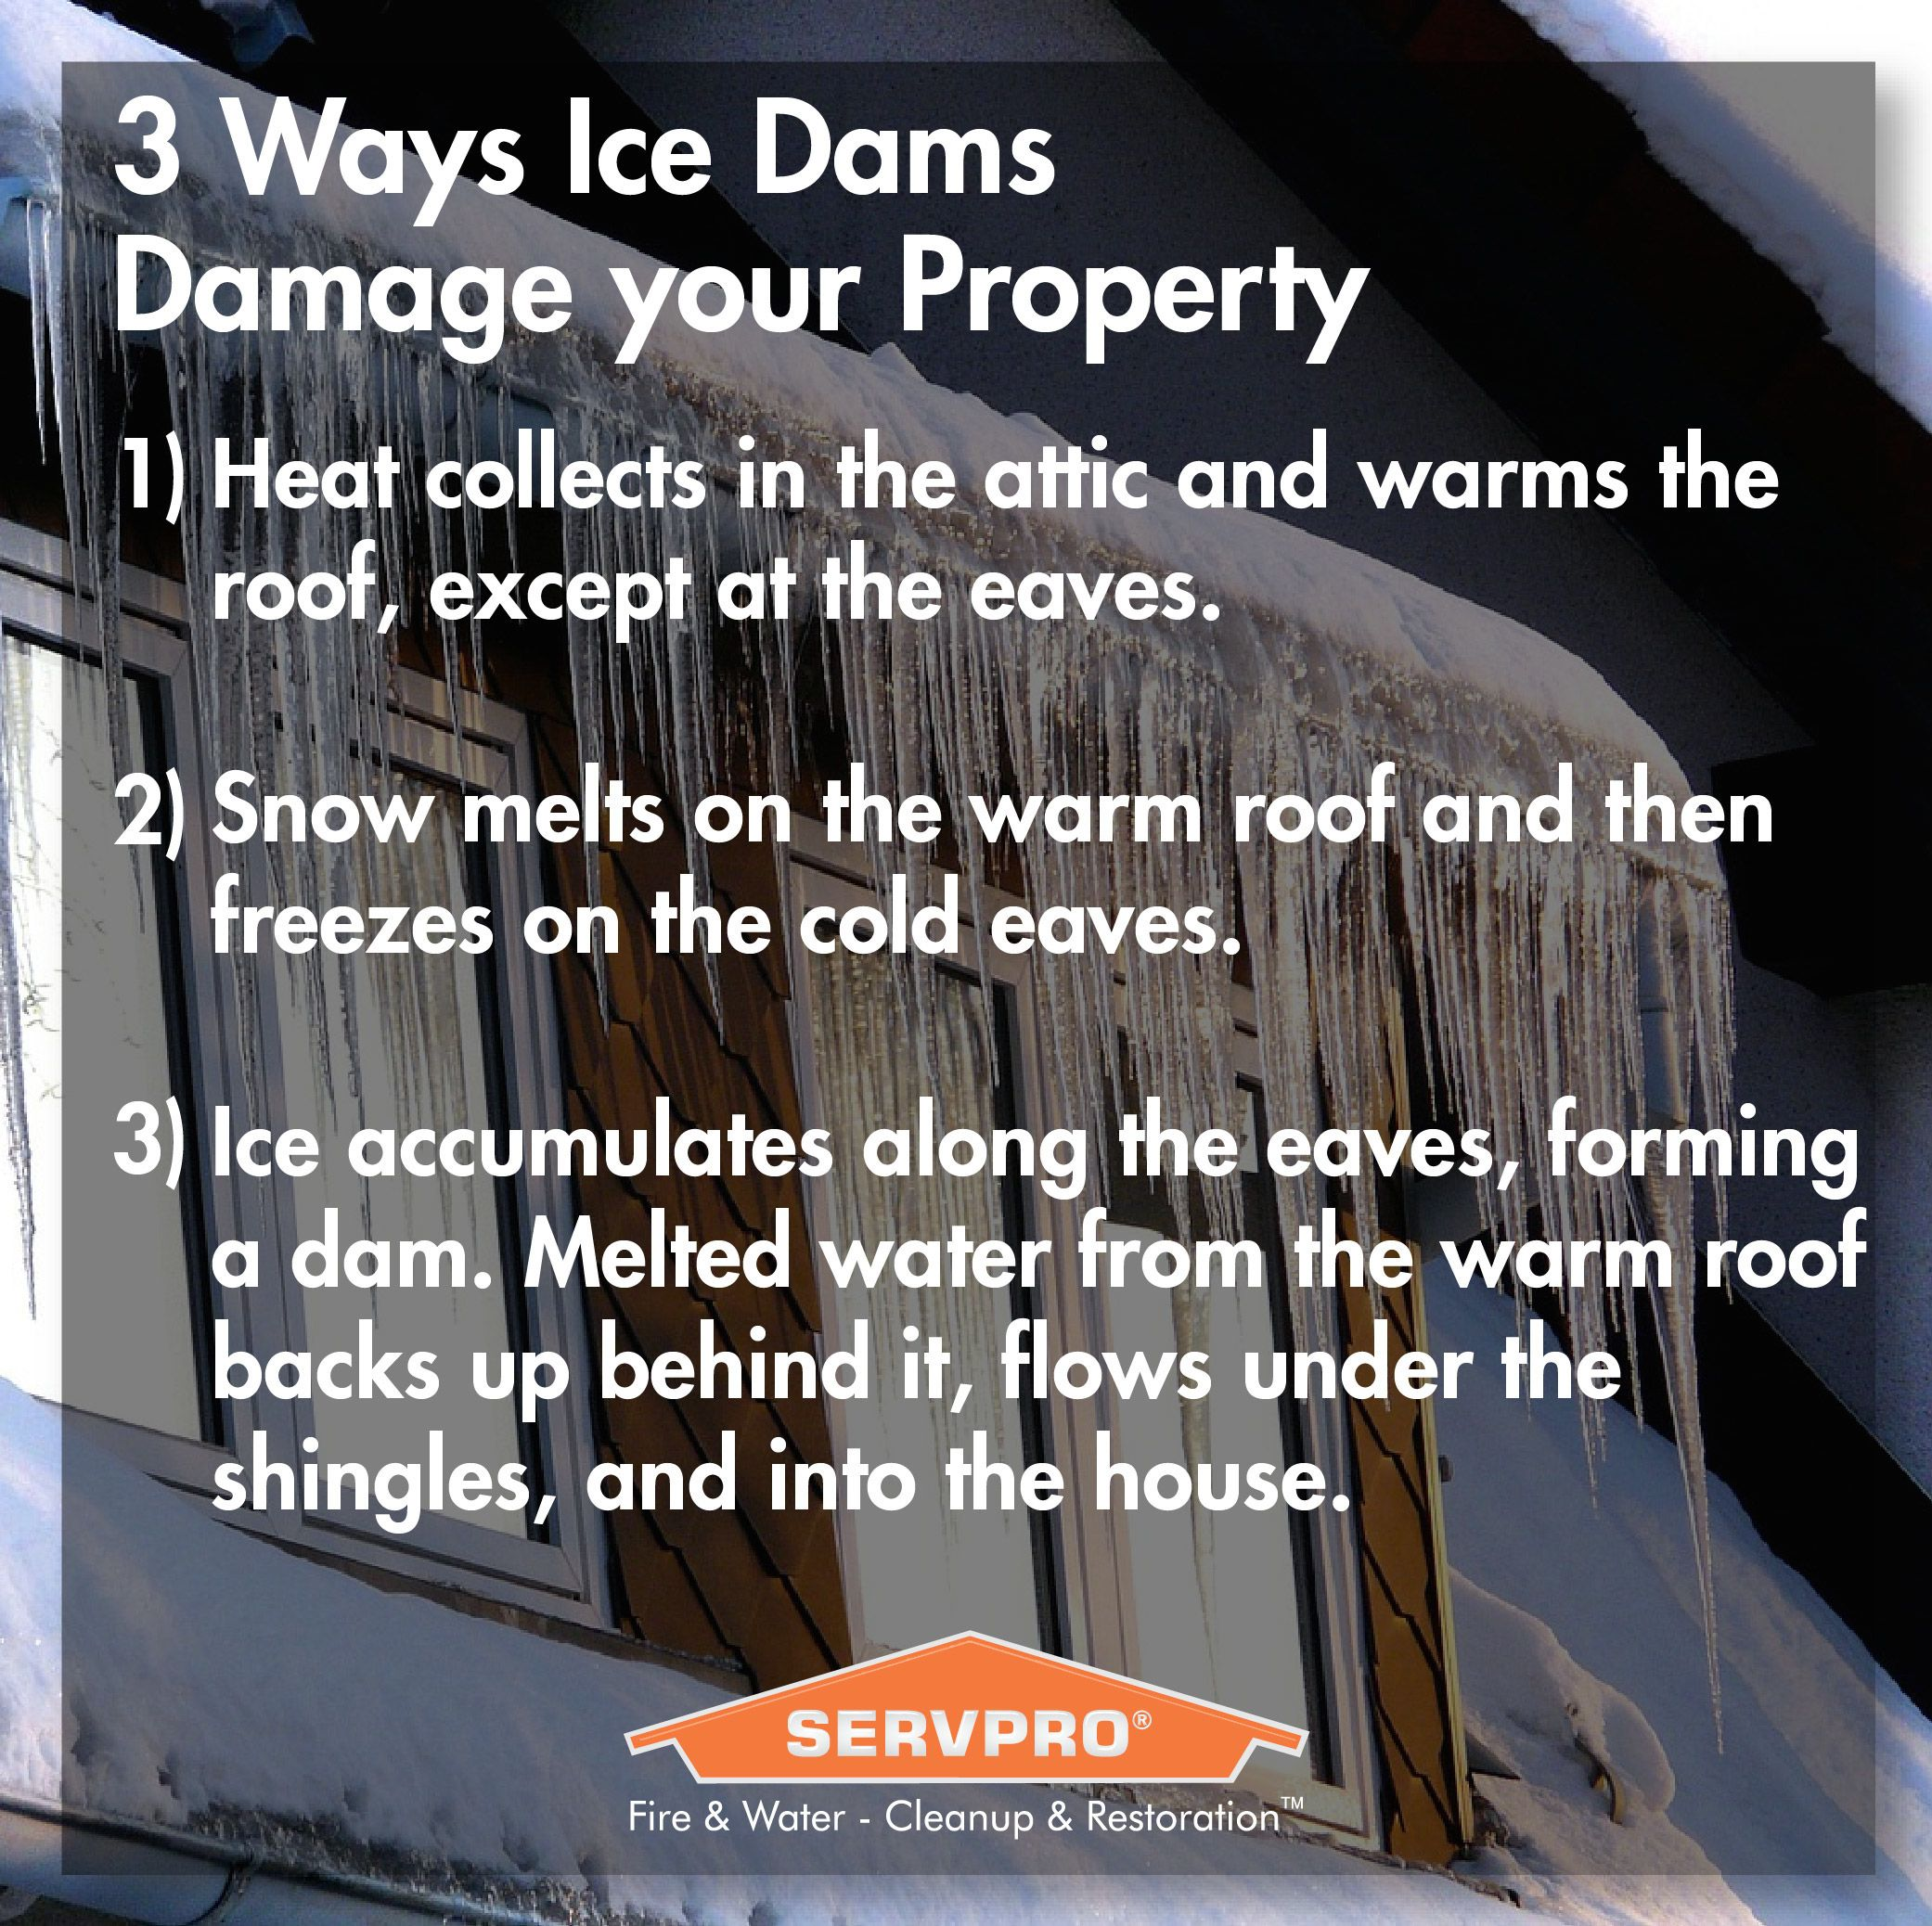 Ice Dams Damage Property Ice Dams Warm Roof Damage Restoration